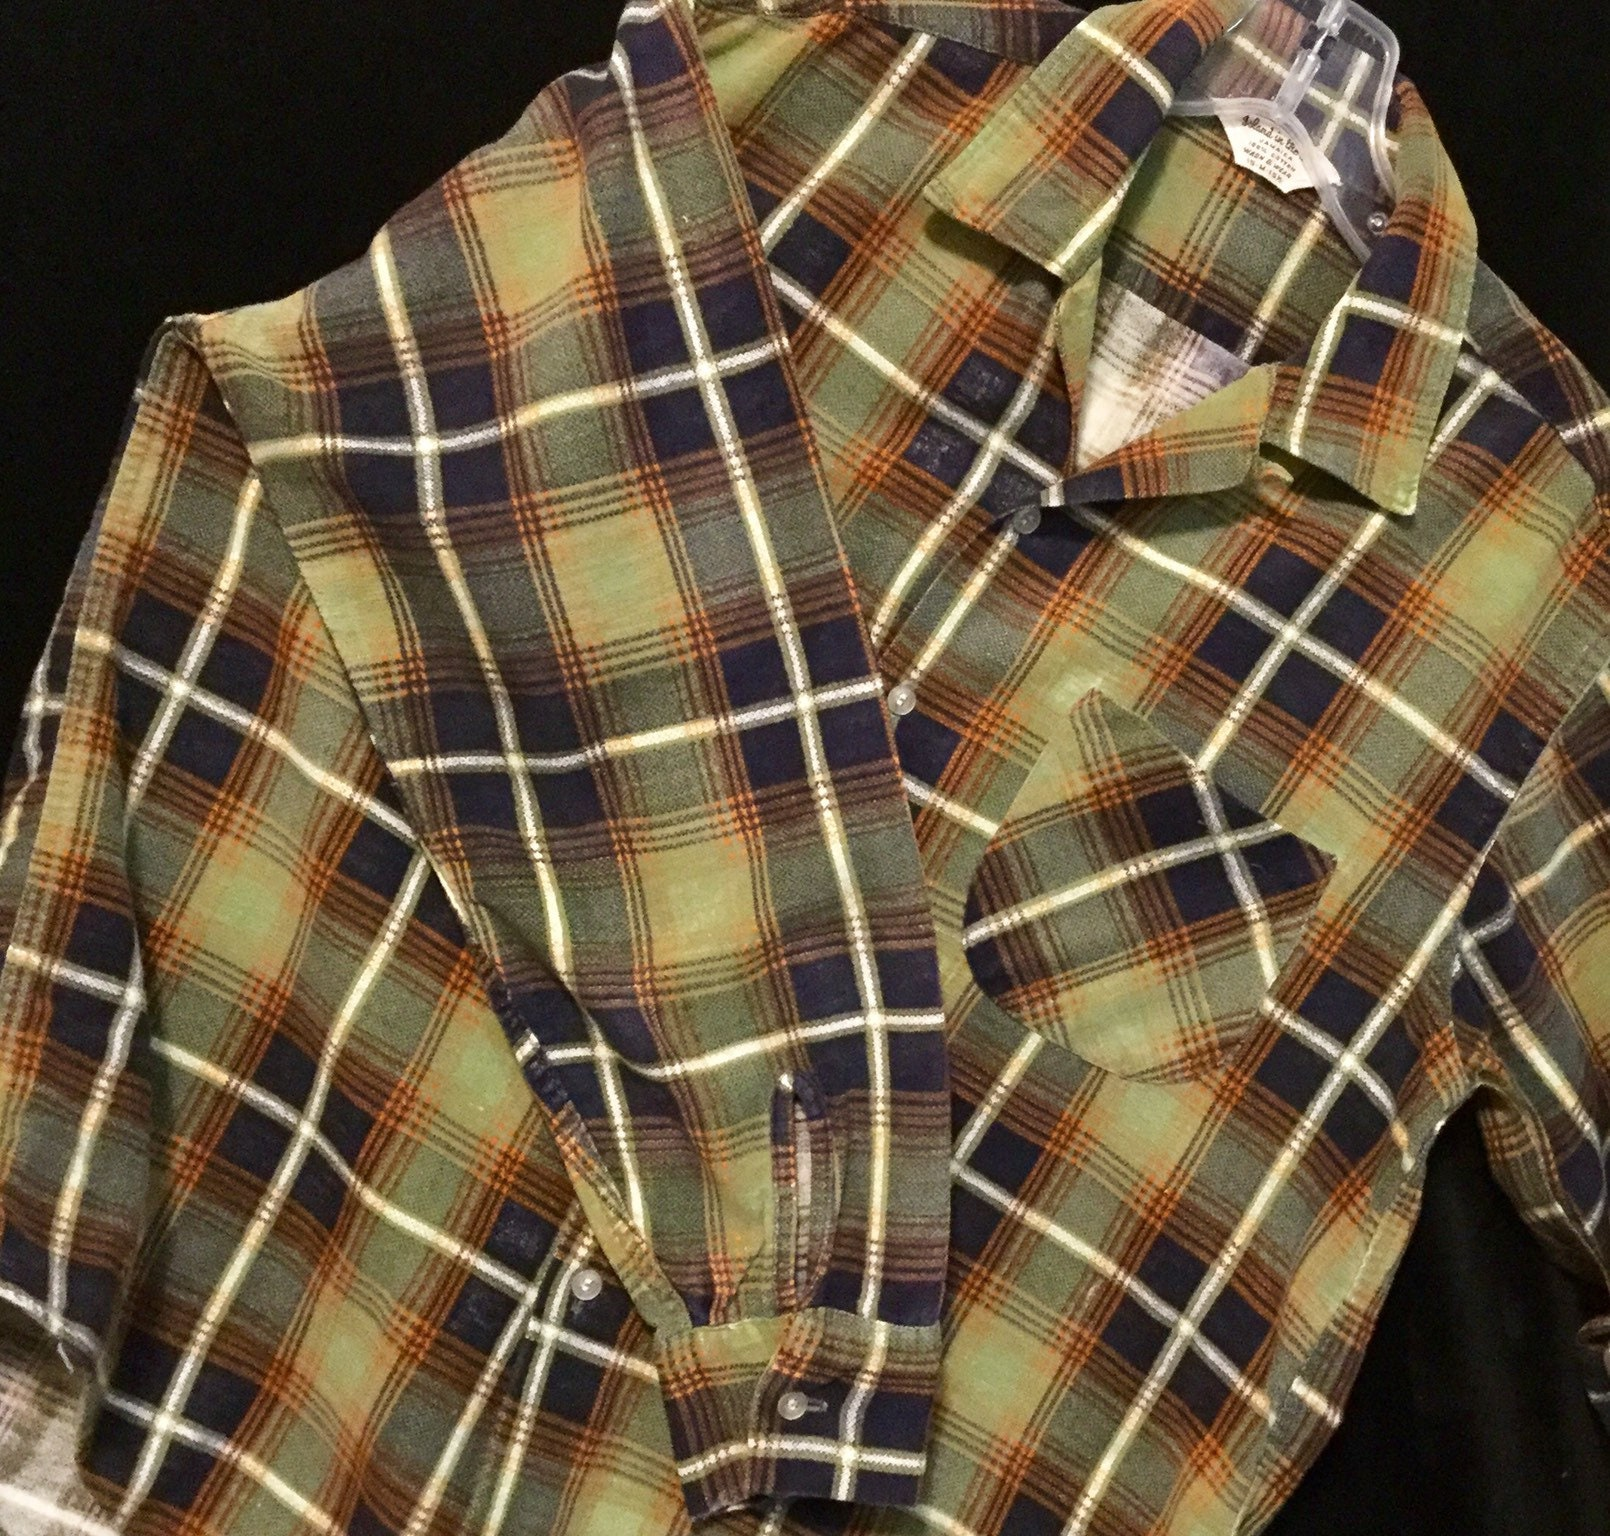 1950s Mens Hats | 50s Vintage Men's Hats 1950S MensUnisex Flannel Shirt Plaid Print Olive Green Island in The Sun Long Sleeve Cotton Winter Size 15-15 12  Chest 44 Vintage $0.00 AT vintagedancer.com